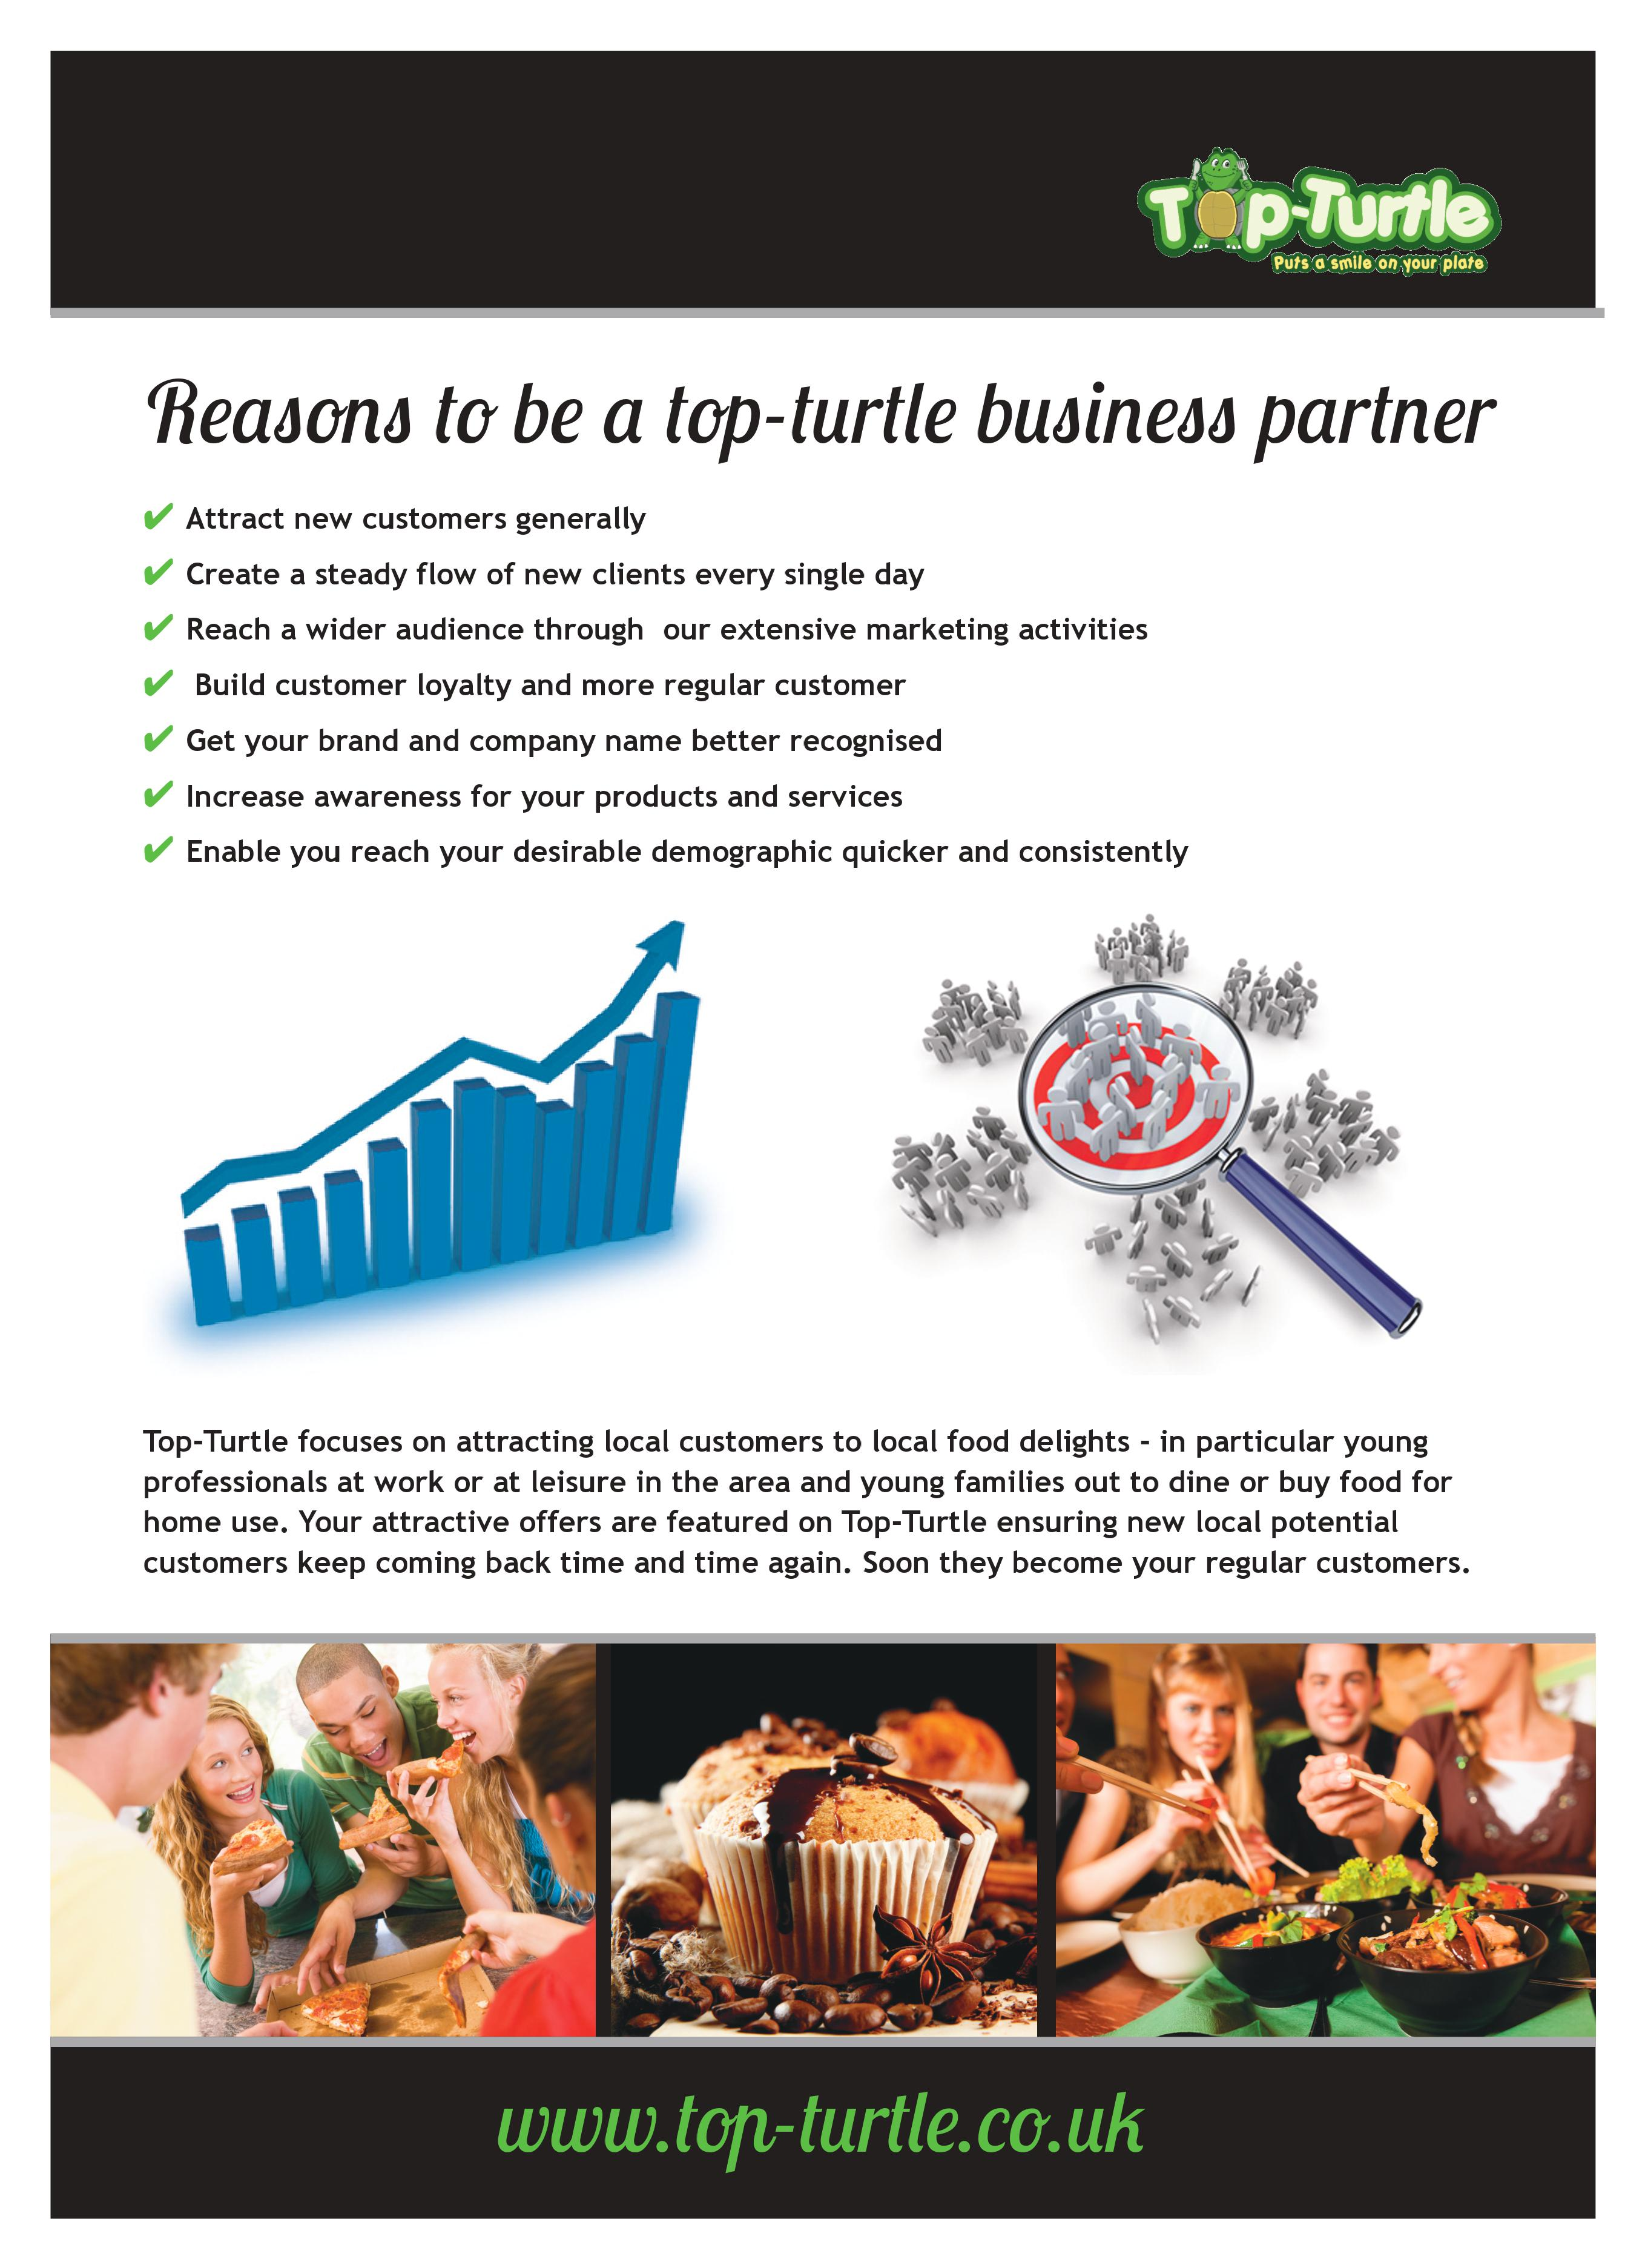 Dpwdesign- Top-turtle